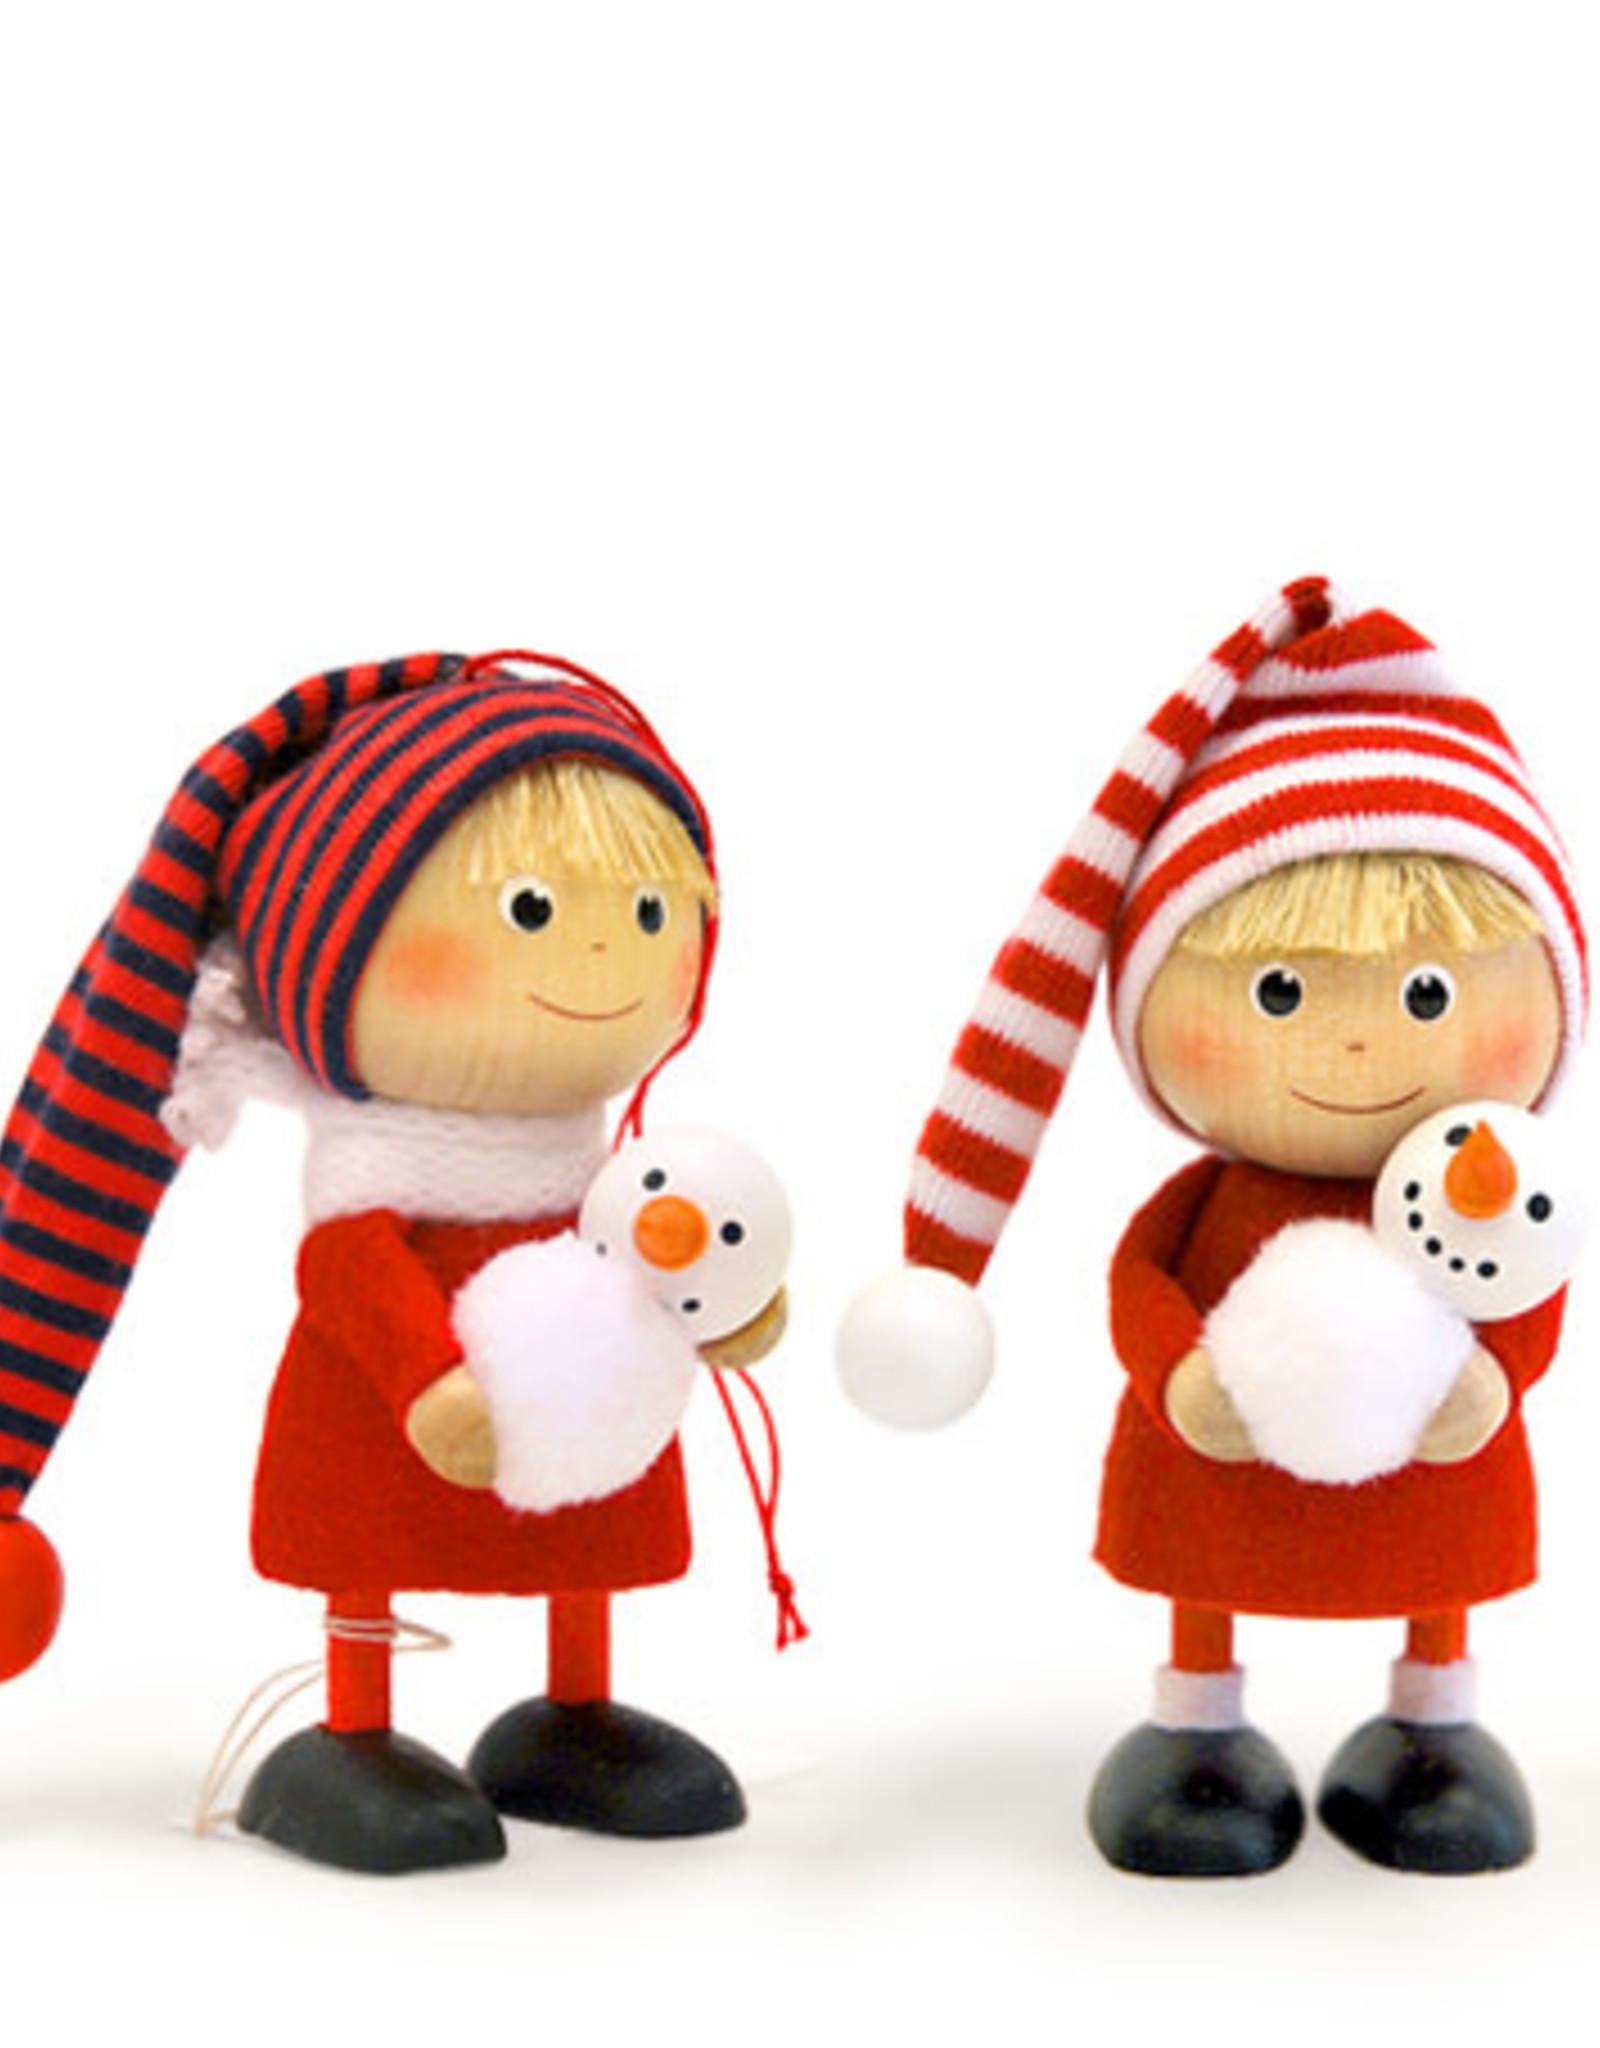 Nordic Dreams Boy Holding Snowman